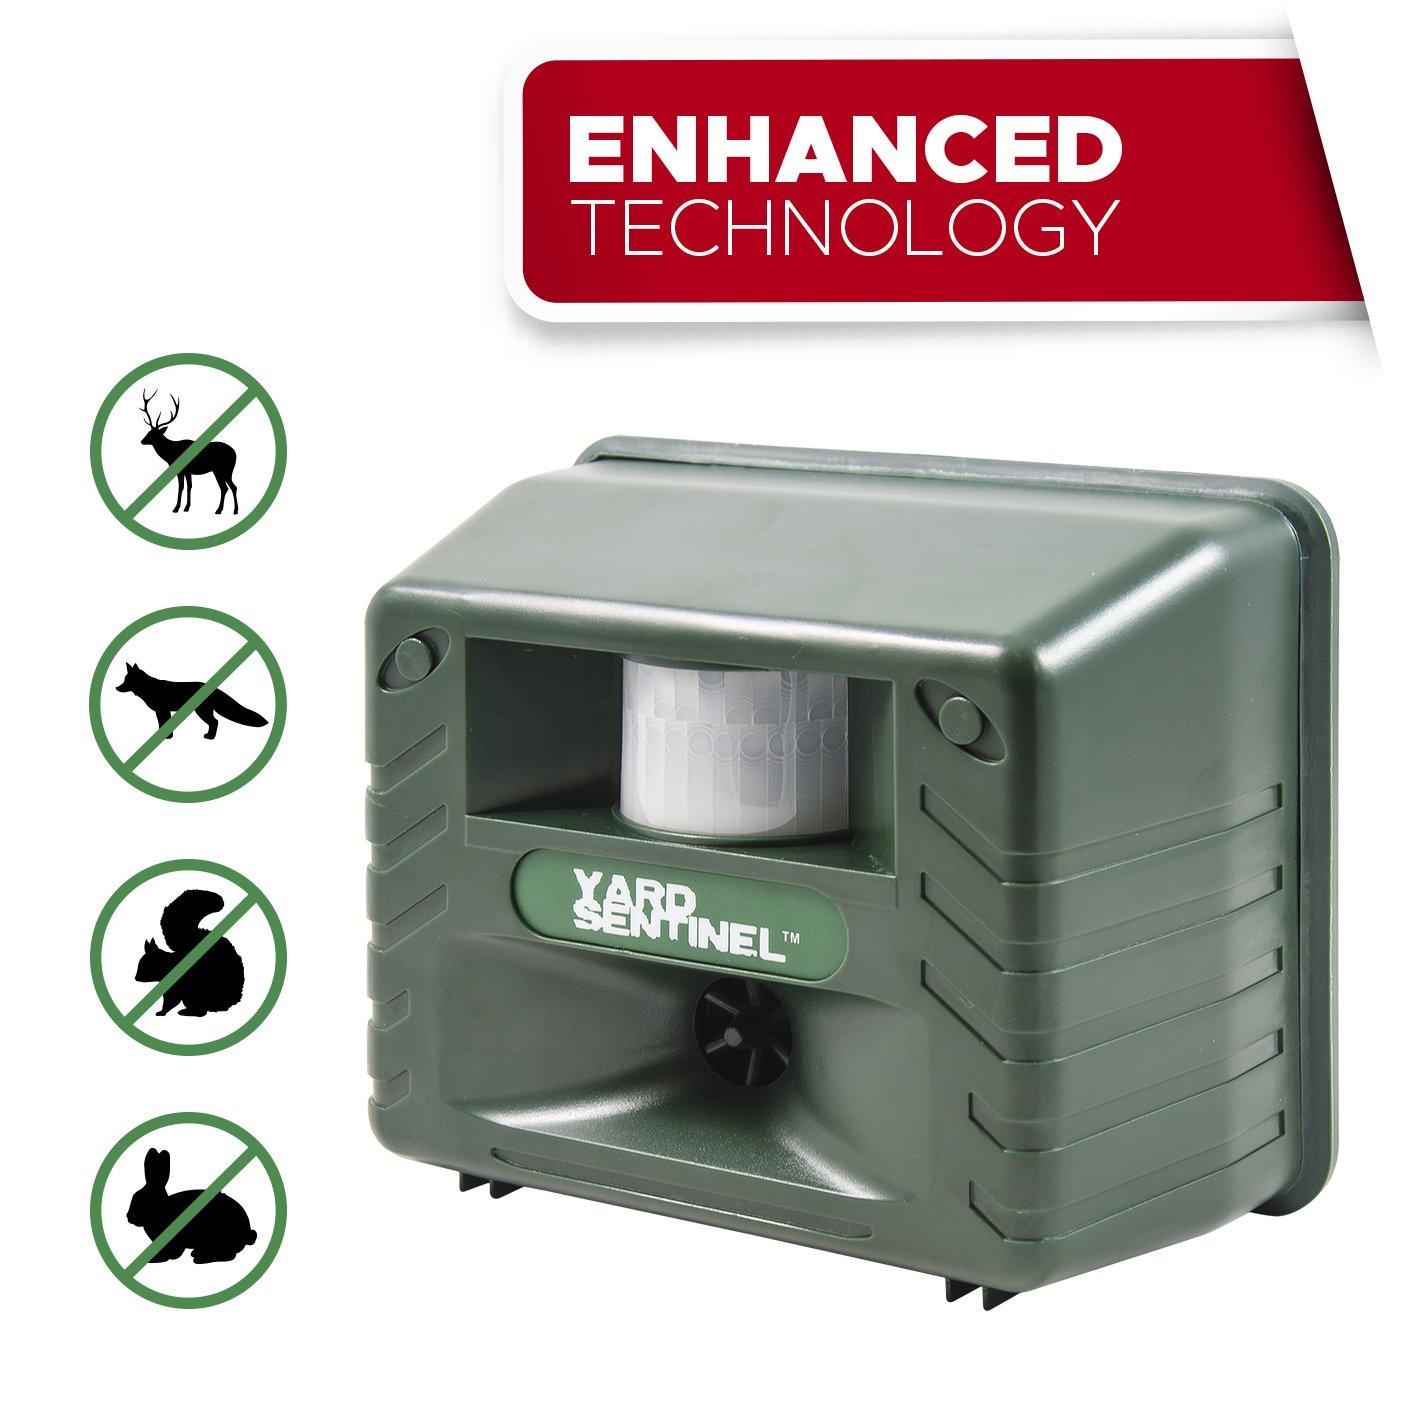 yard sentinel electronic ultrasonic pest repeller animal control